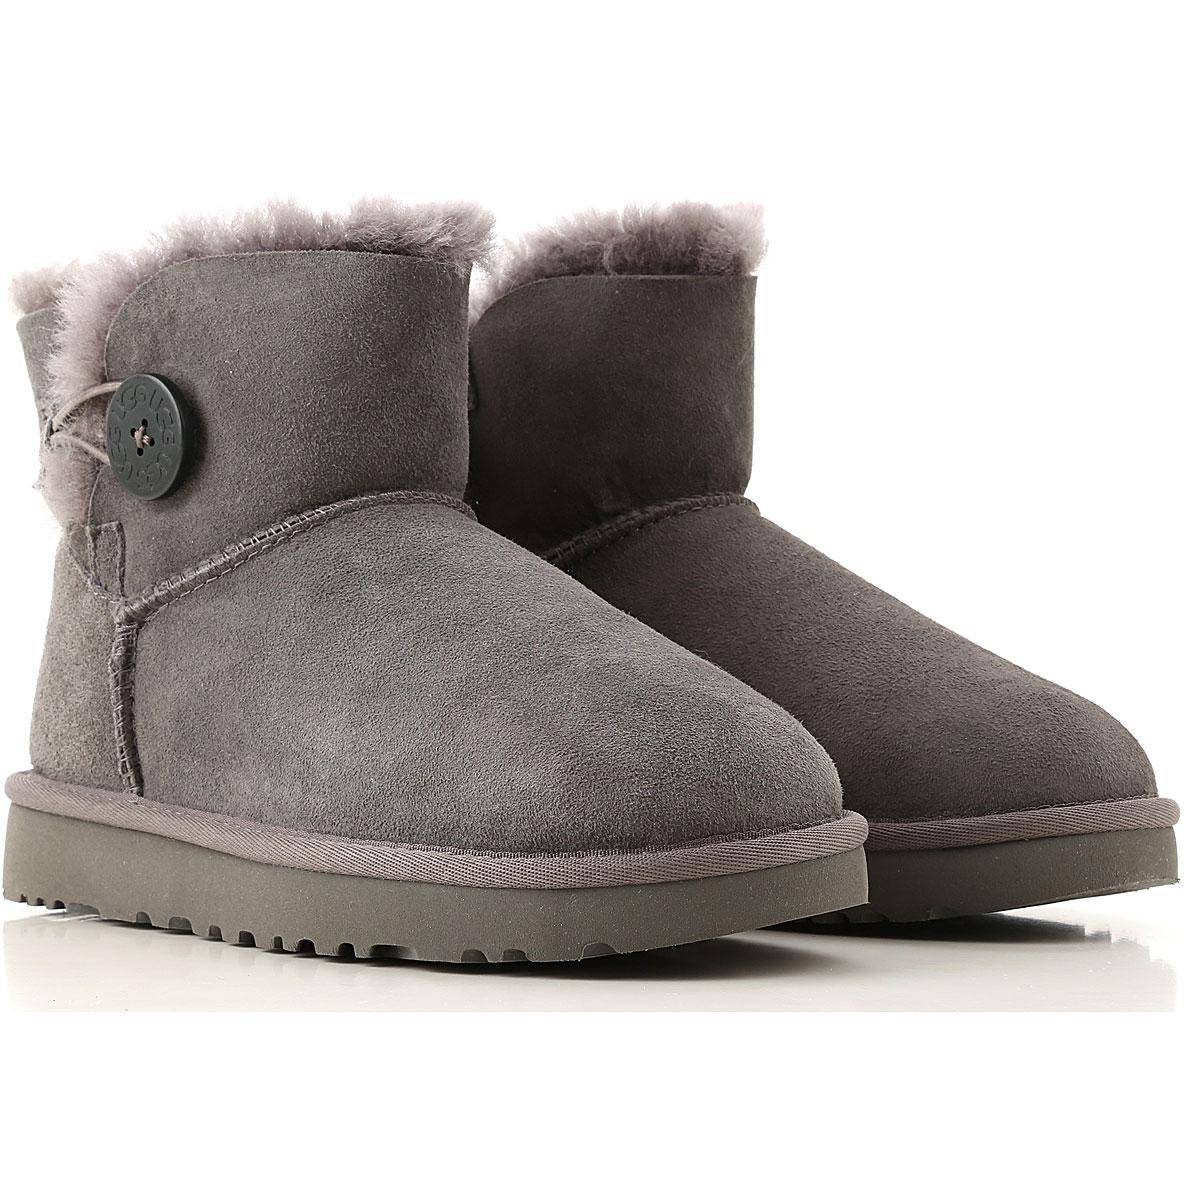 UGG Boots for Women, Booties On Sale, Medium Grey, Suede leather, 2019, USA 5 UK 3 5 EU 36 JAPAN 220 USA 6 UK 4 5 EU 37 JAPAN 230 USA 10 UK 8 5